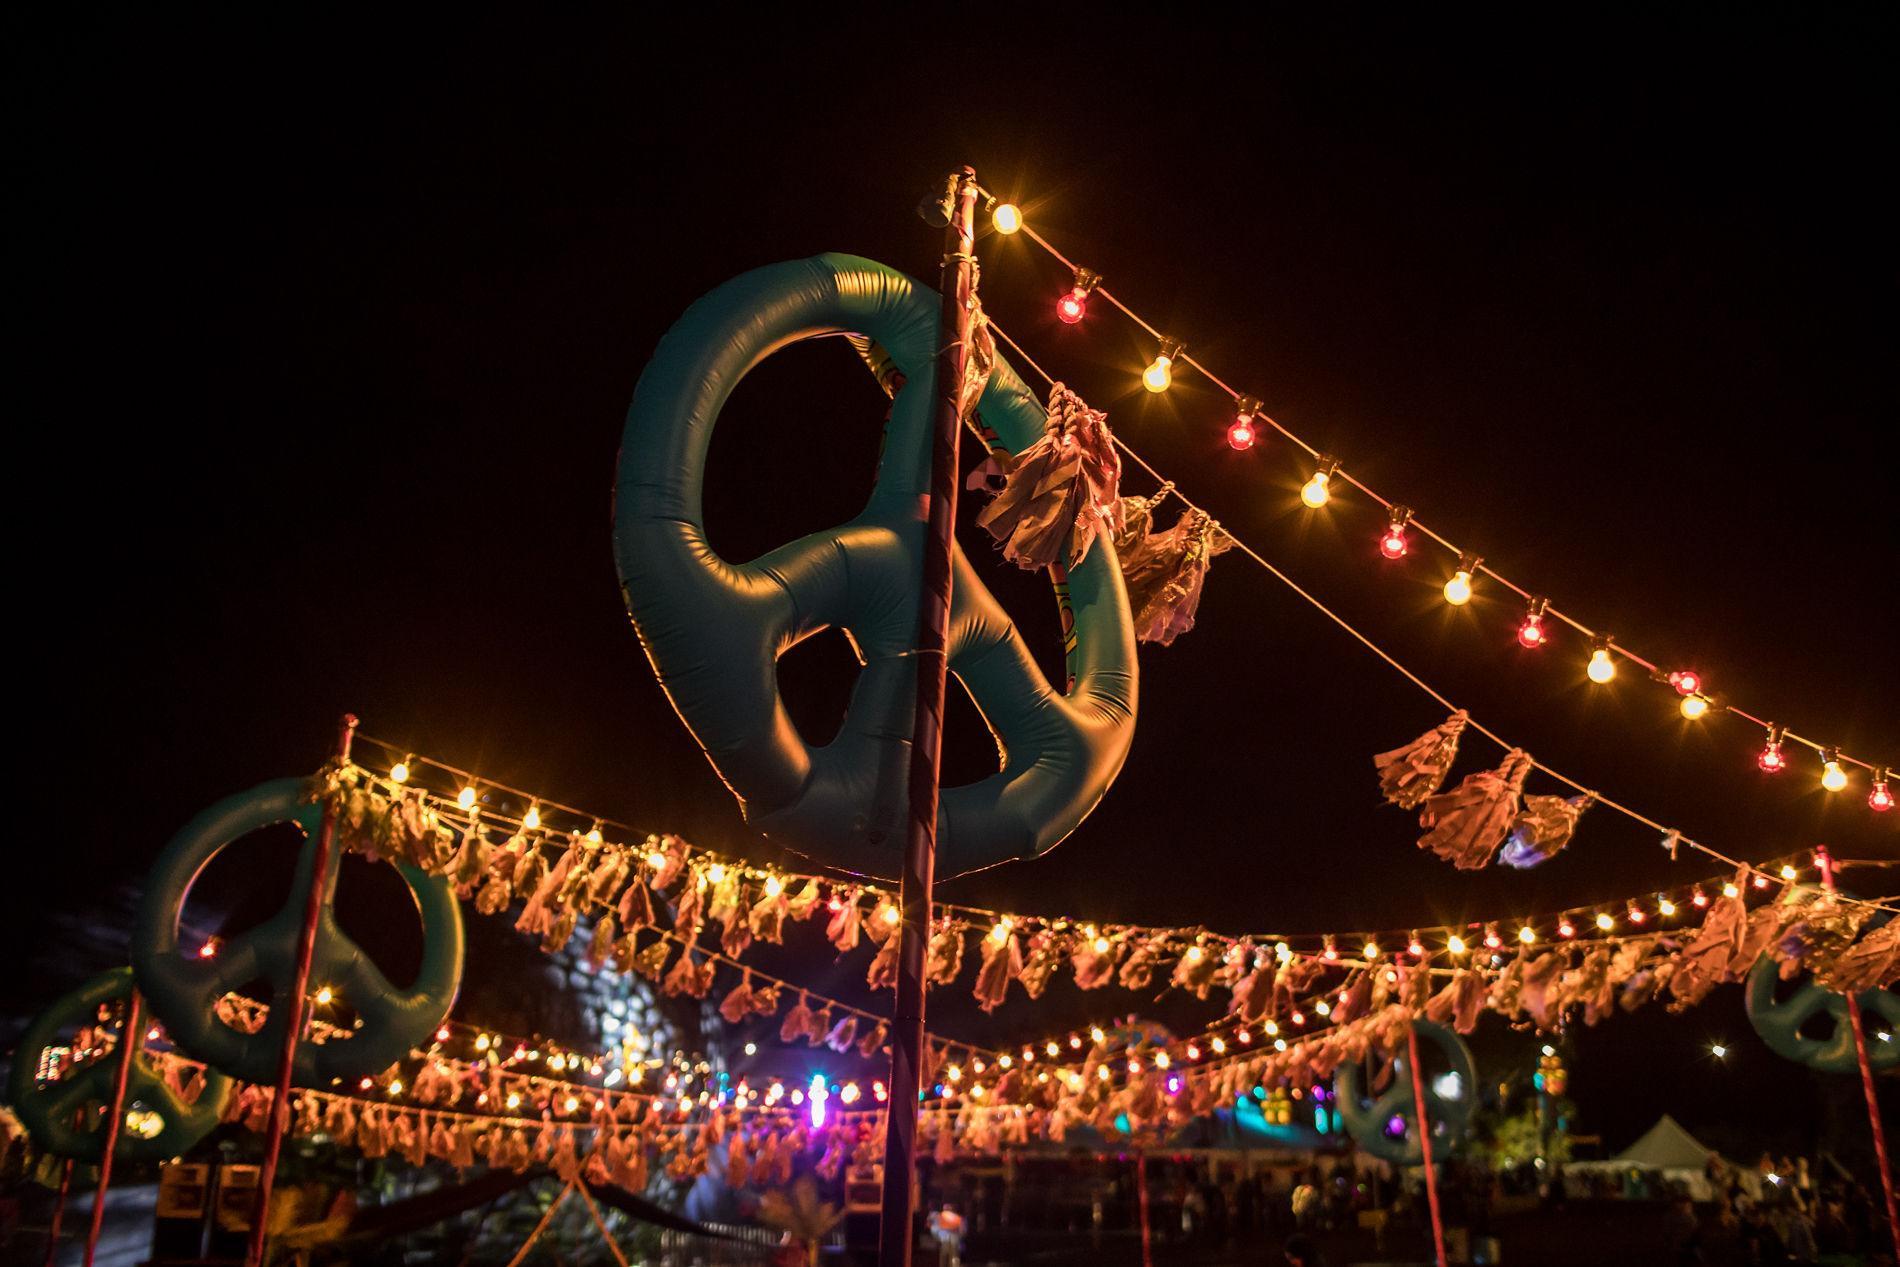 41-CampBestival2017-DisneyRascal-CL-VIC_7818.jpg